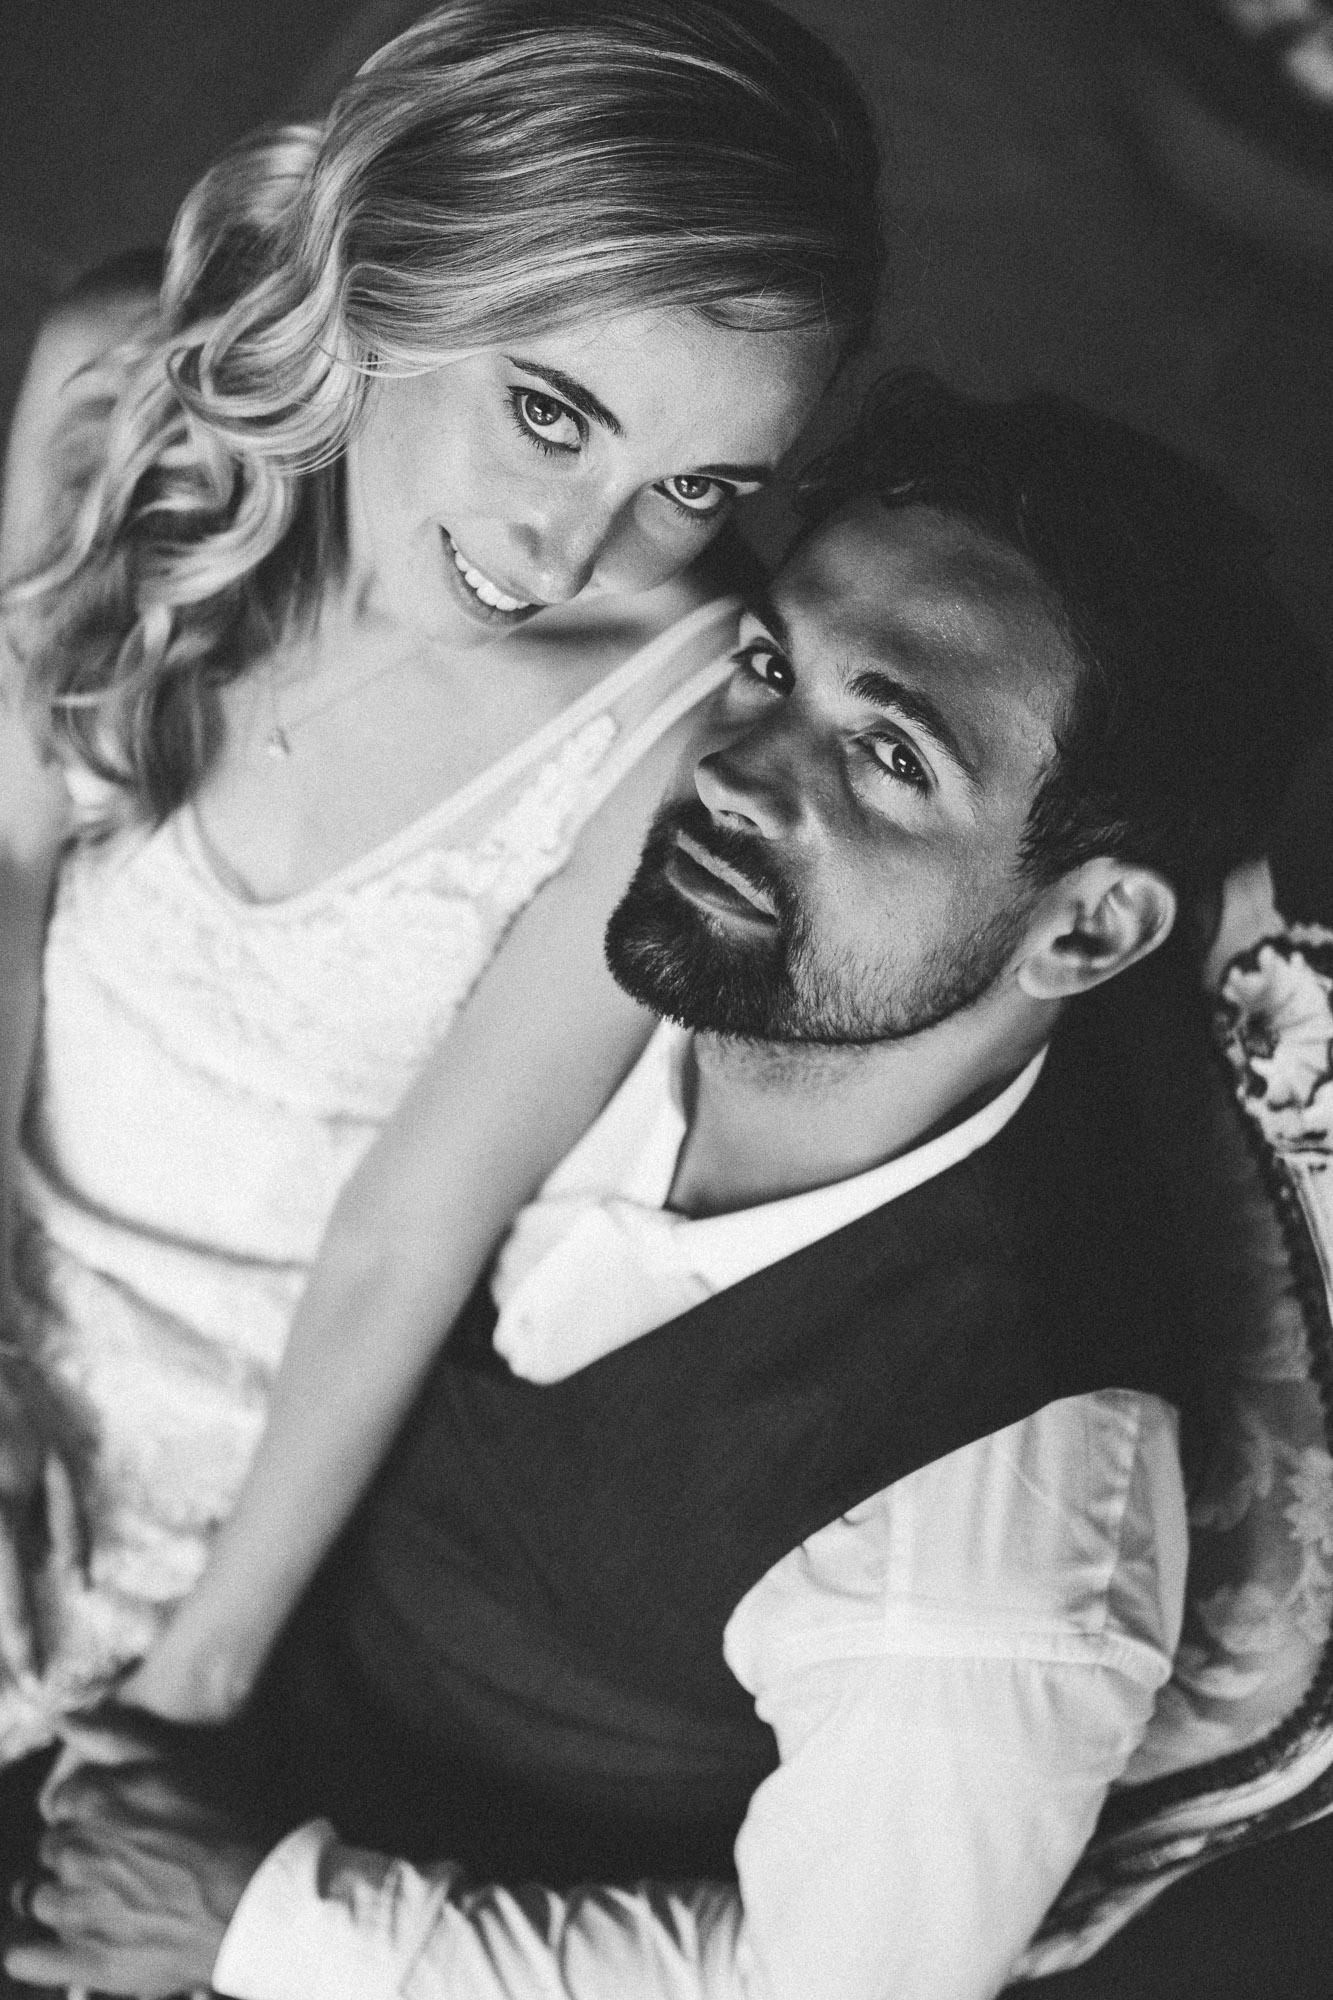 20180720-Memoryfactory-Sara&Jacopo-68- Hochzeit.jpg